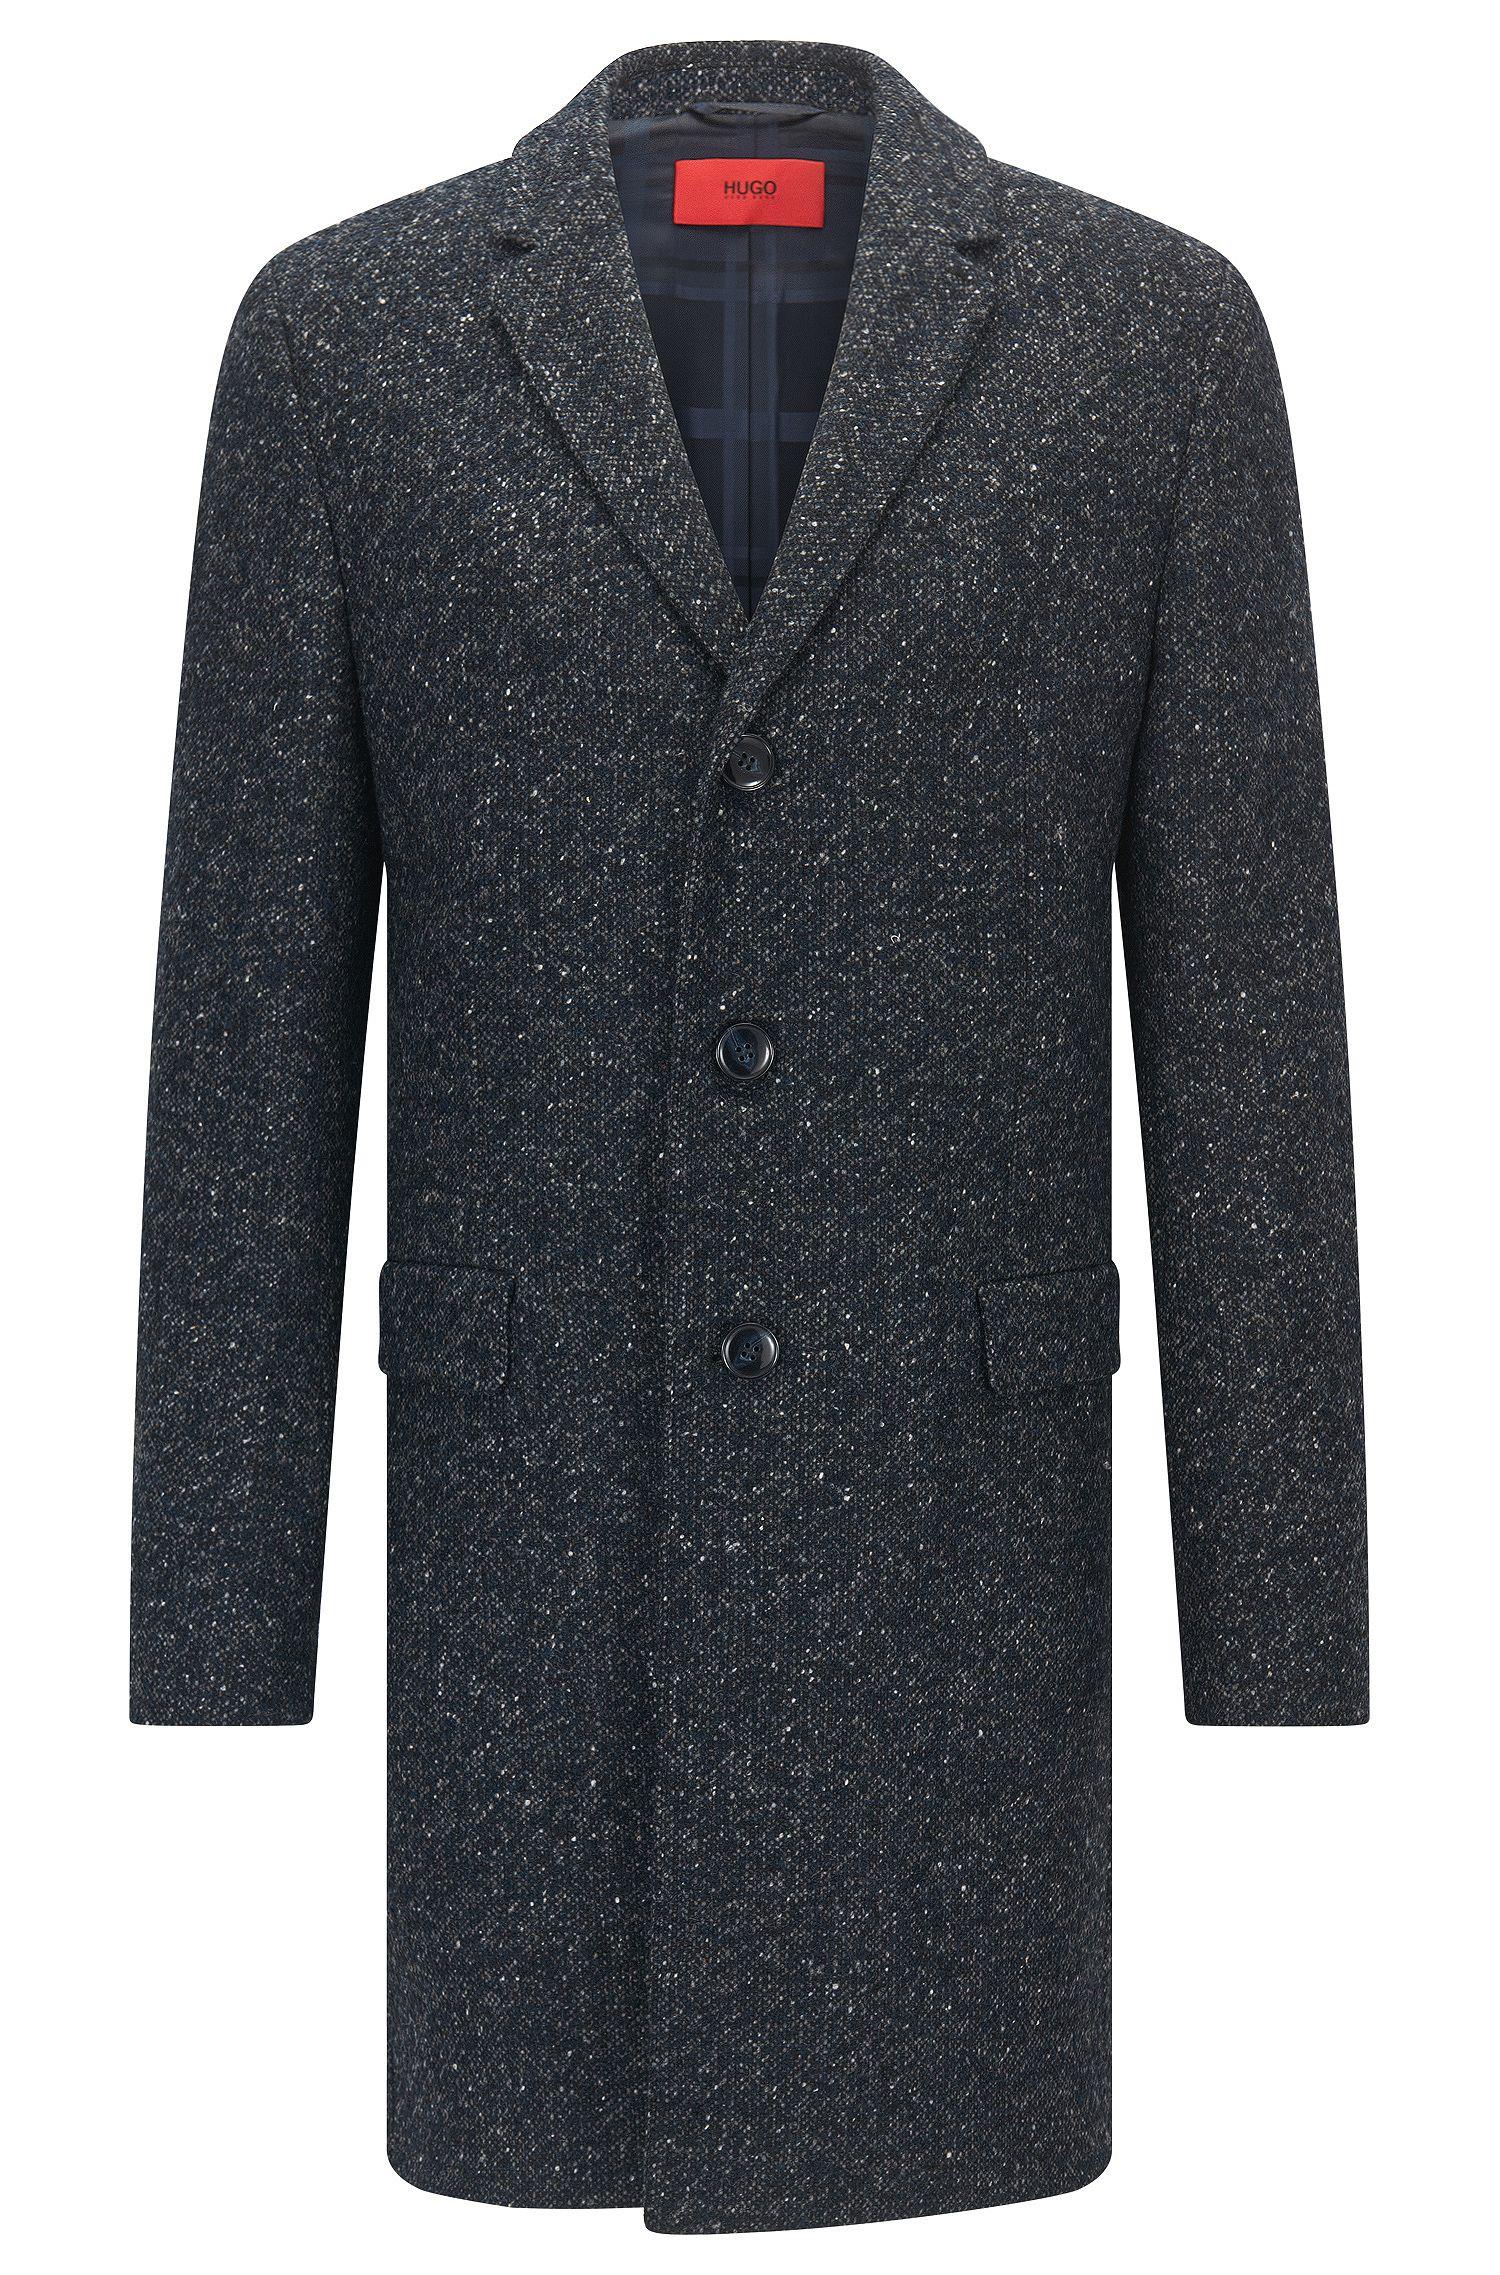 Melierter Slim-Fit Mantel aus Woll-Mix